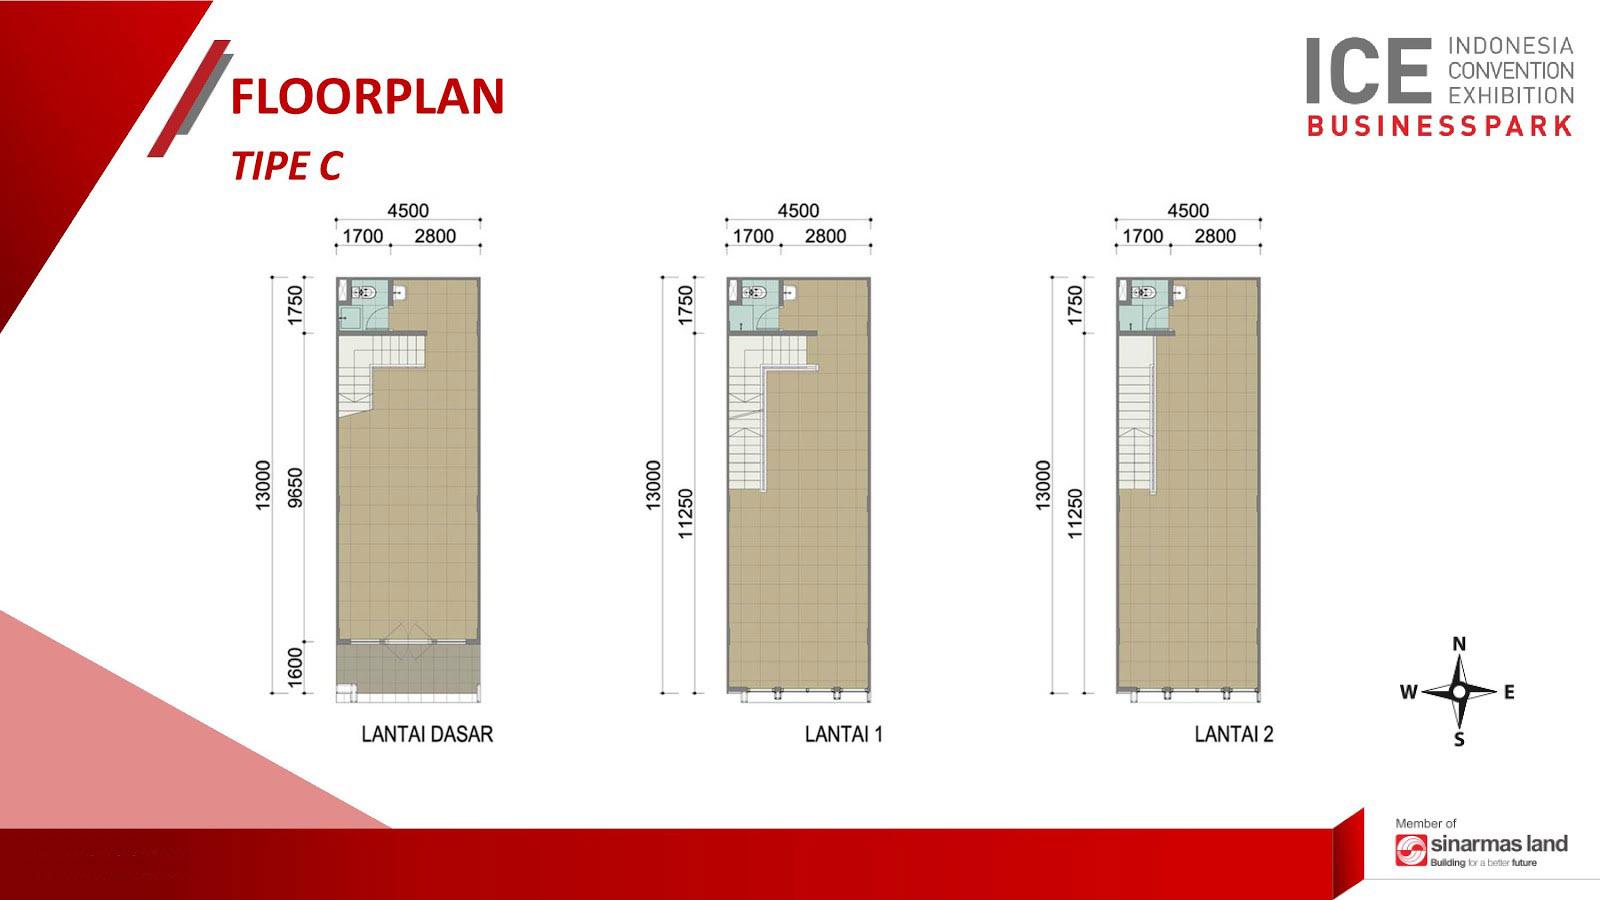 Blokplan Ruko ICE Business Park BSD - Tipe C